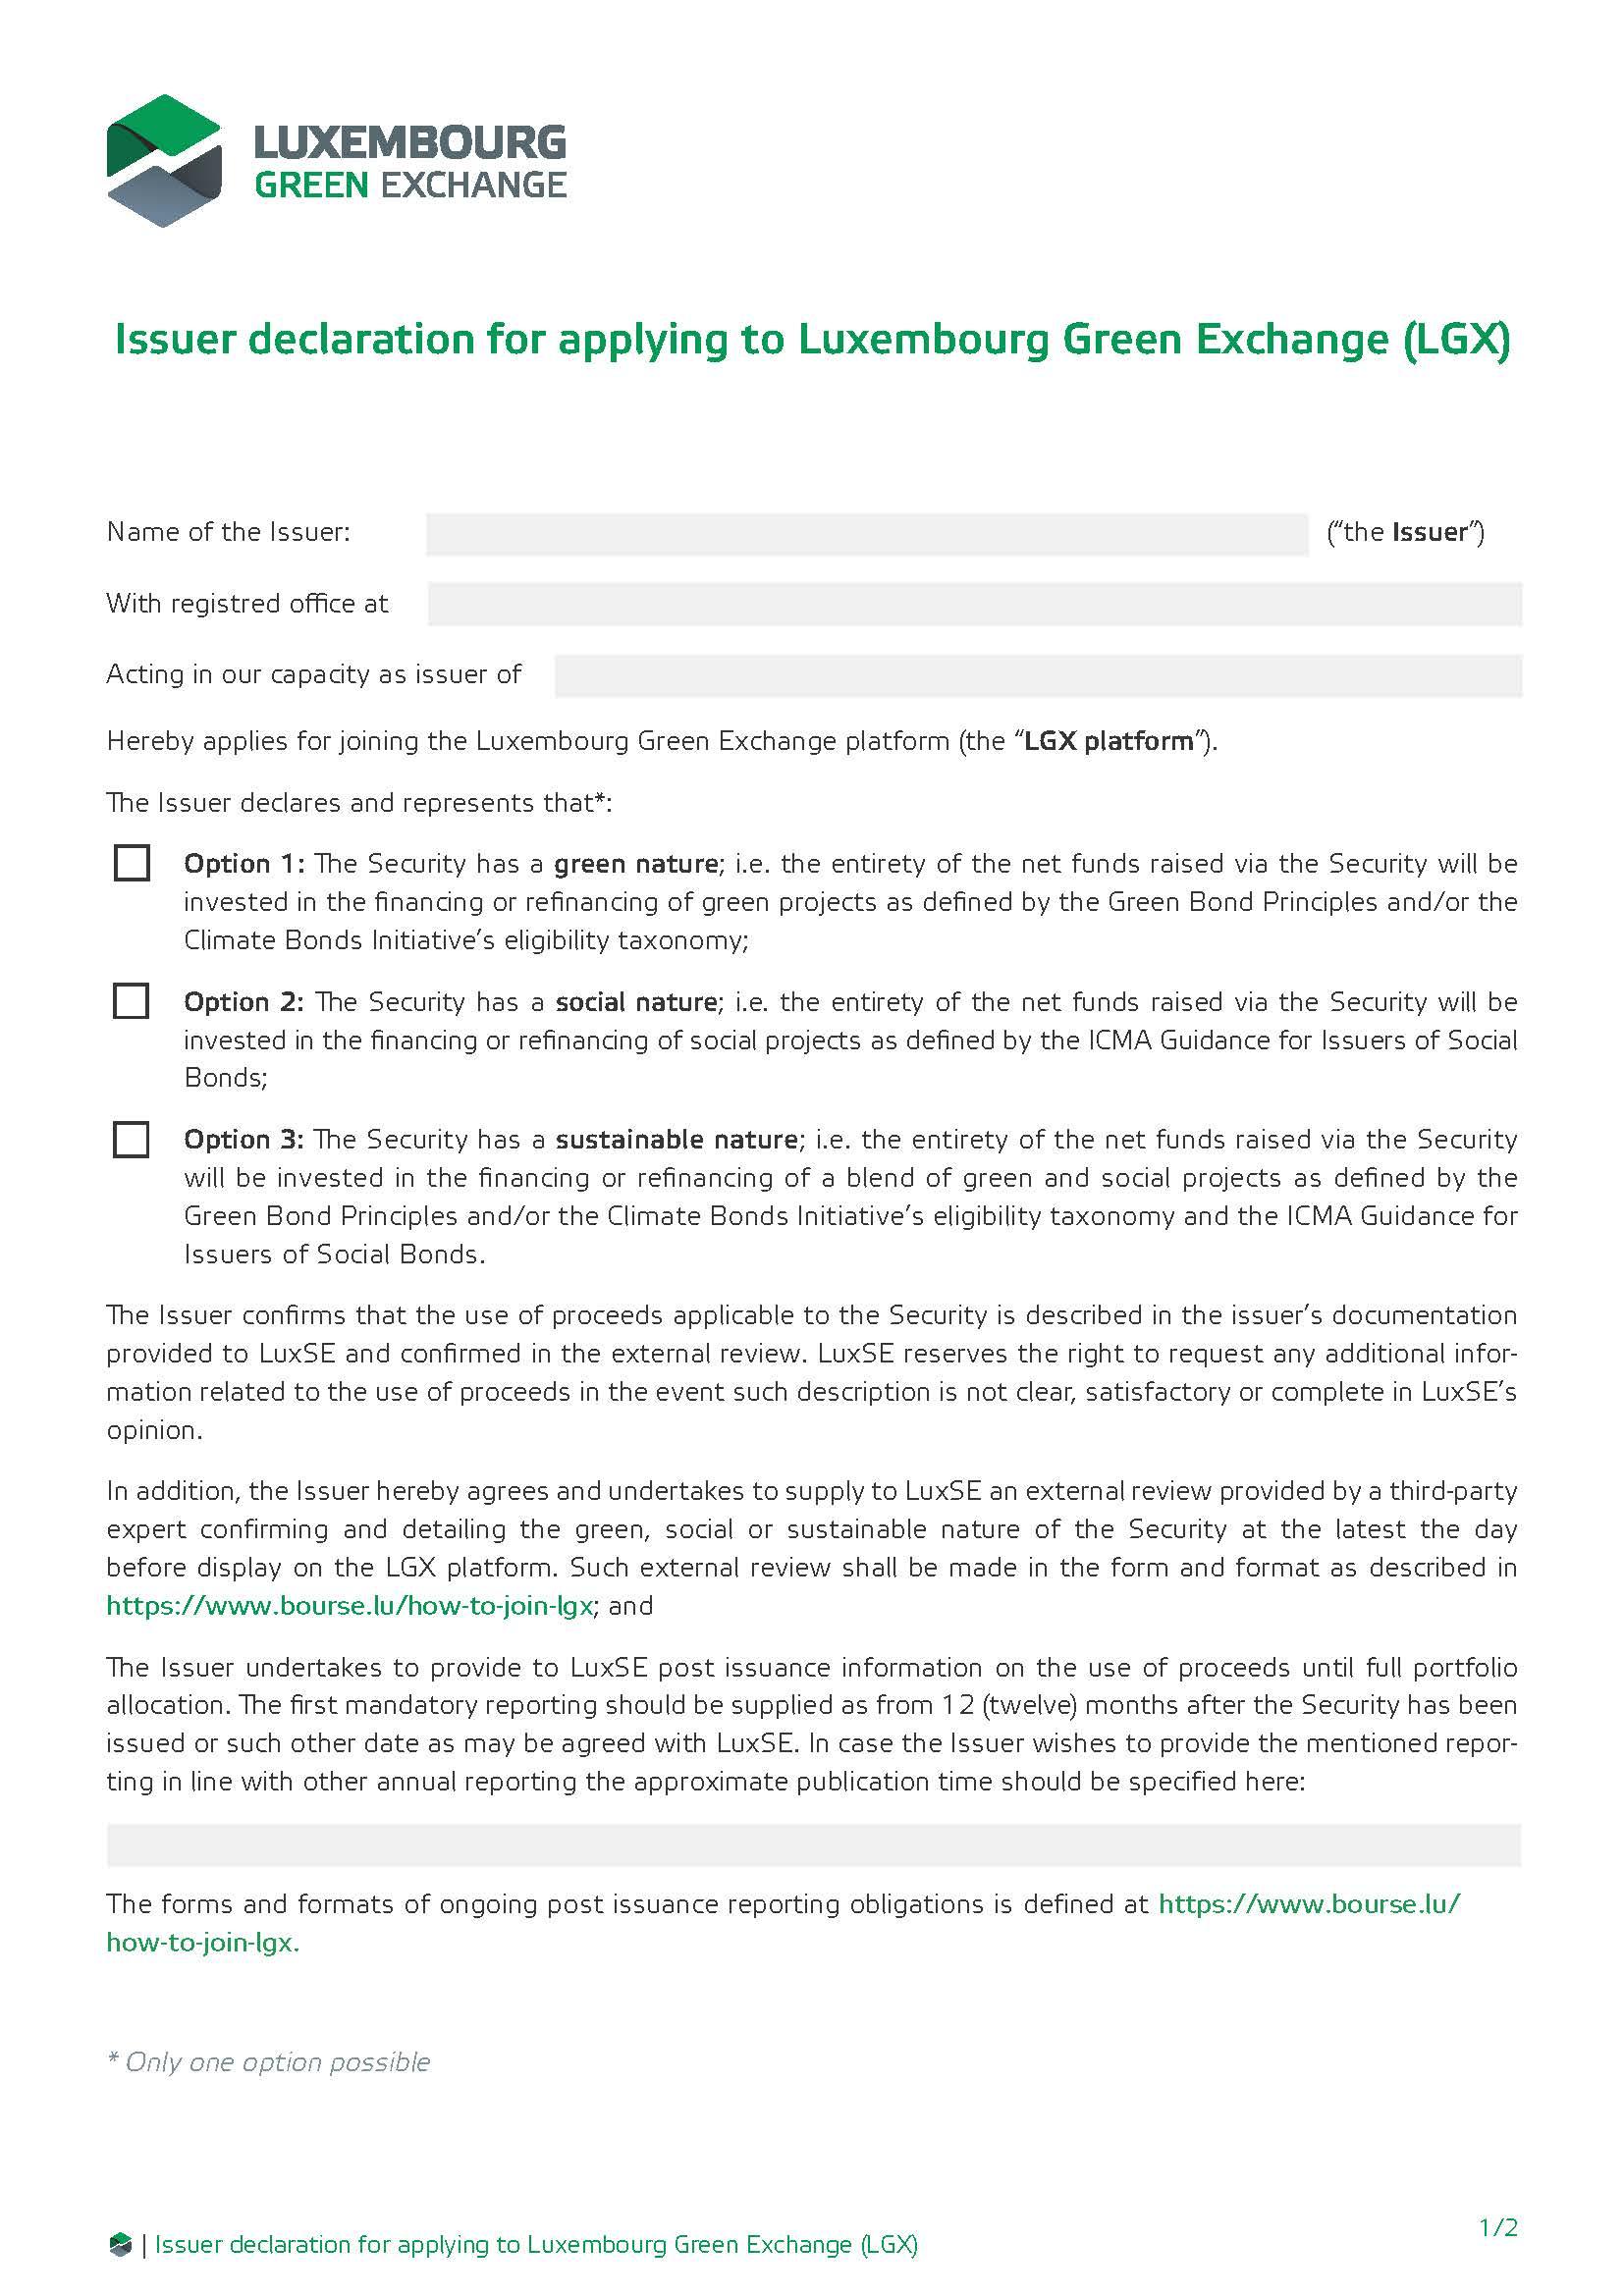 form-LGX-application_bonds.png